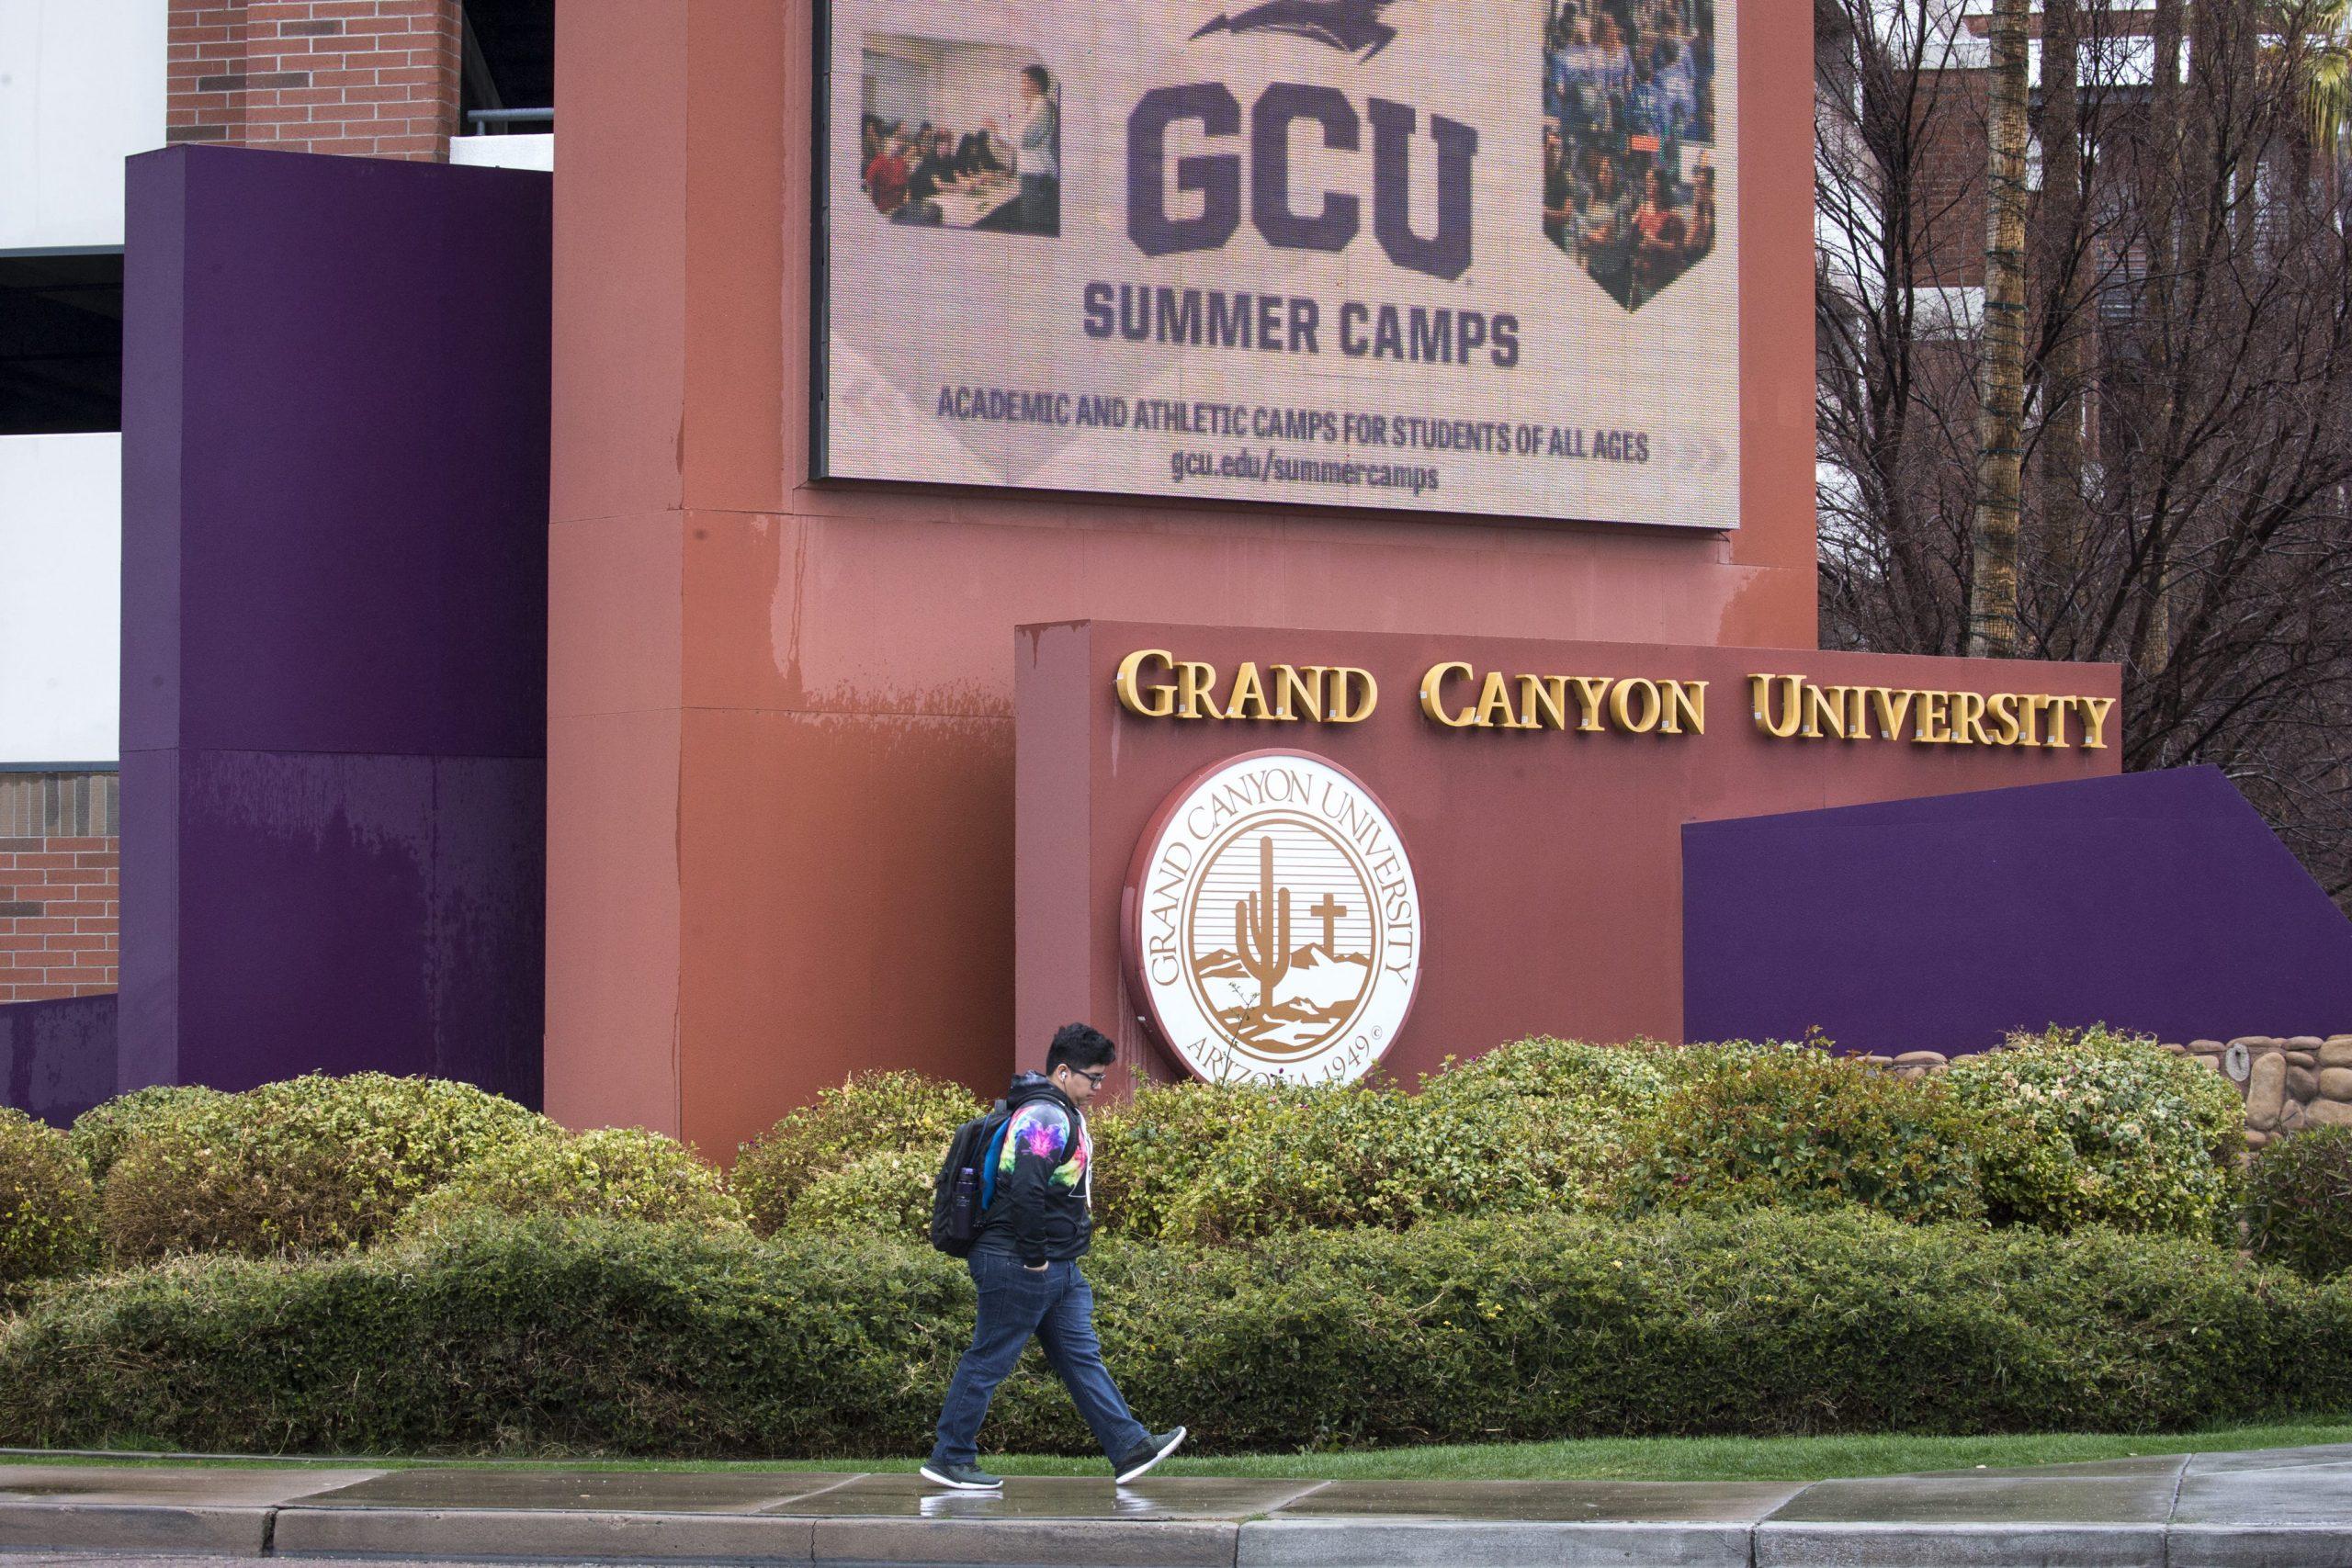 Grand Canyon University, Maricopa County Community Pertaining To Semester Dates For University Of Phoenix